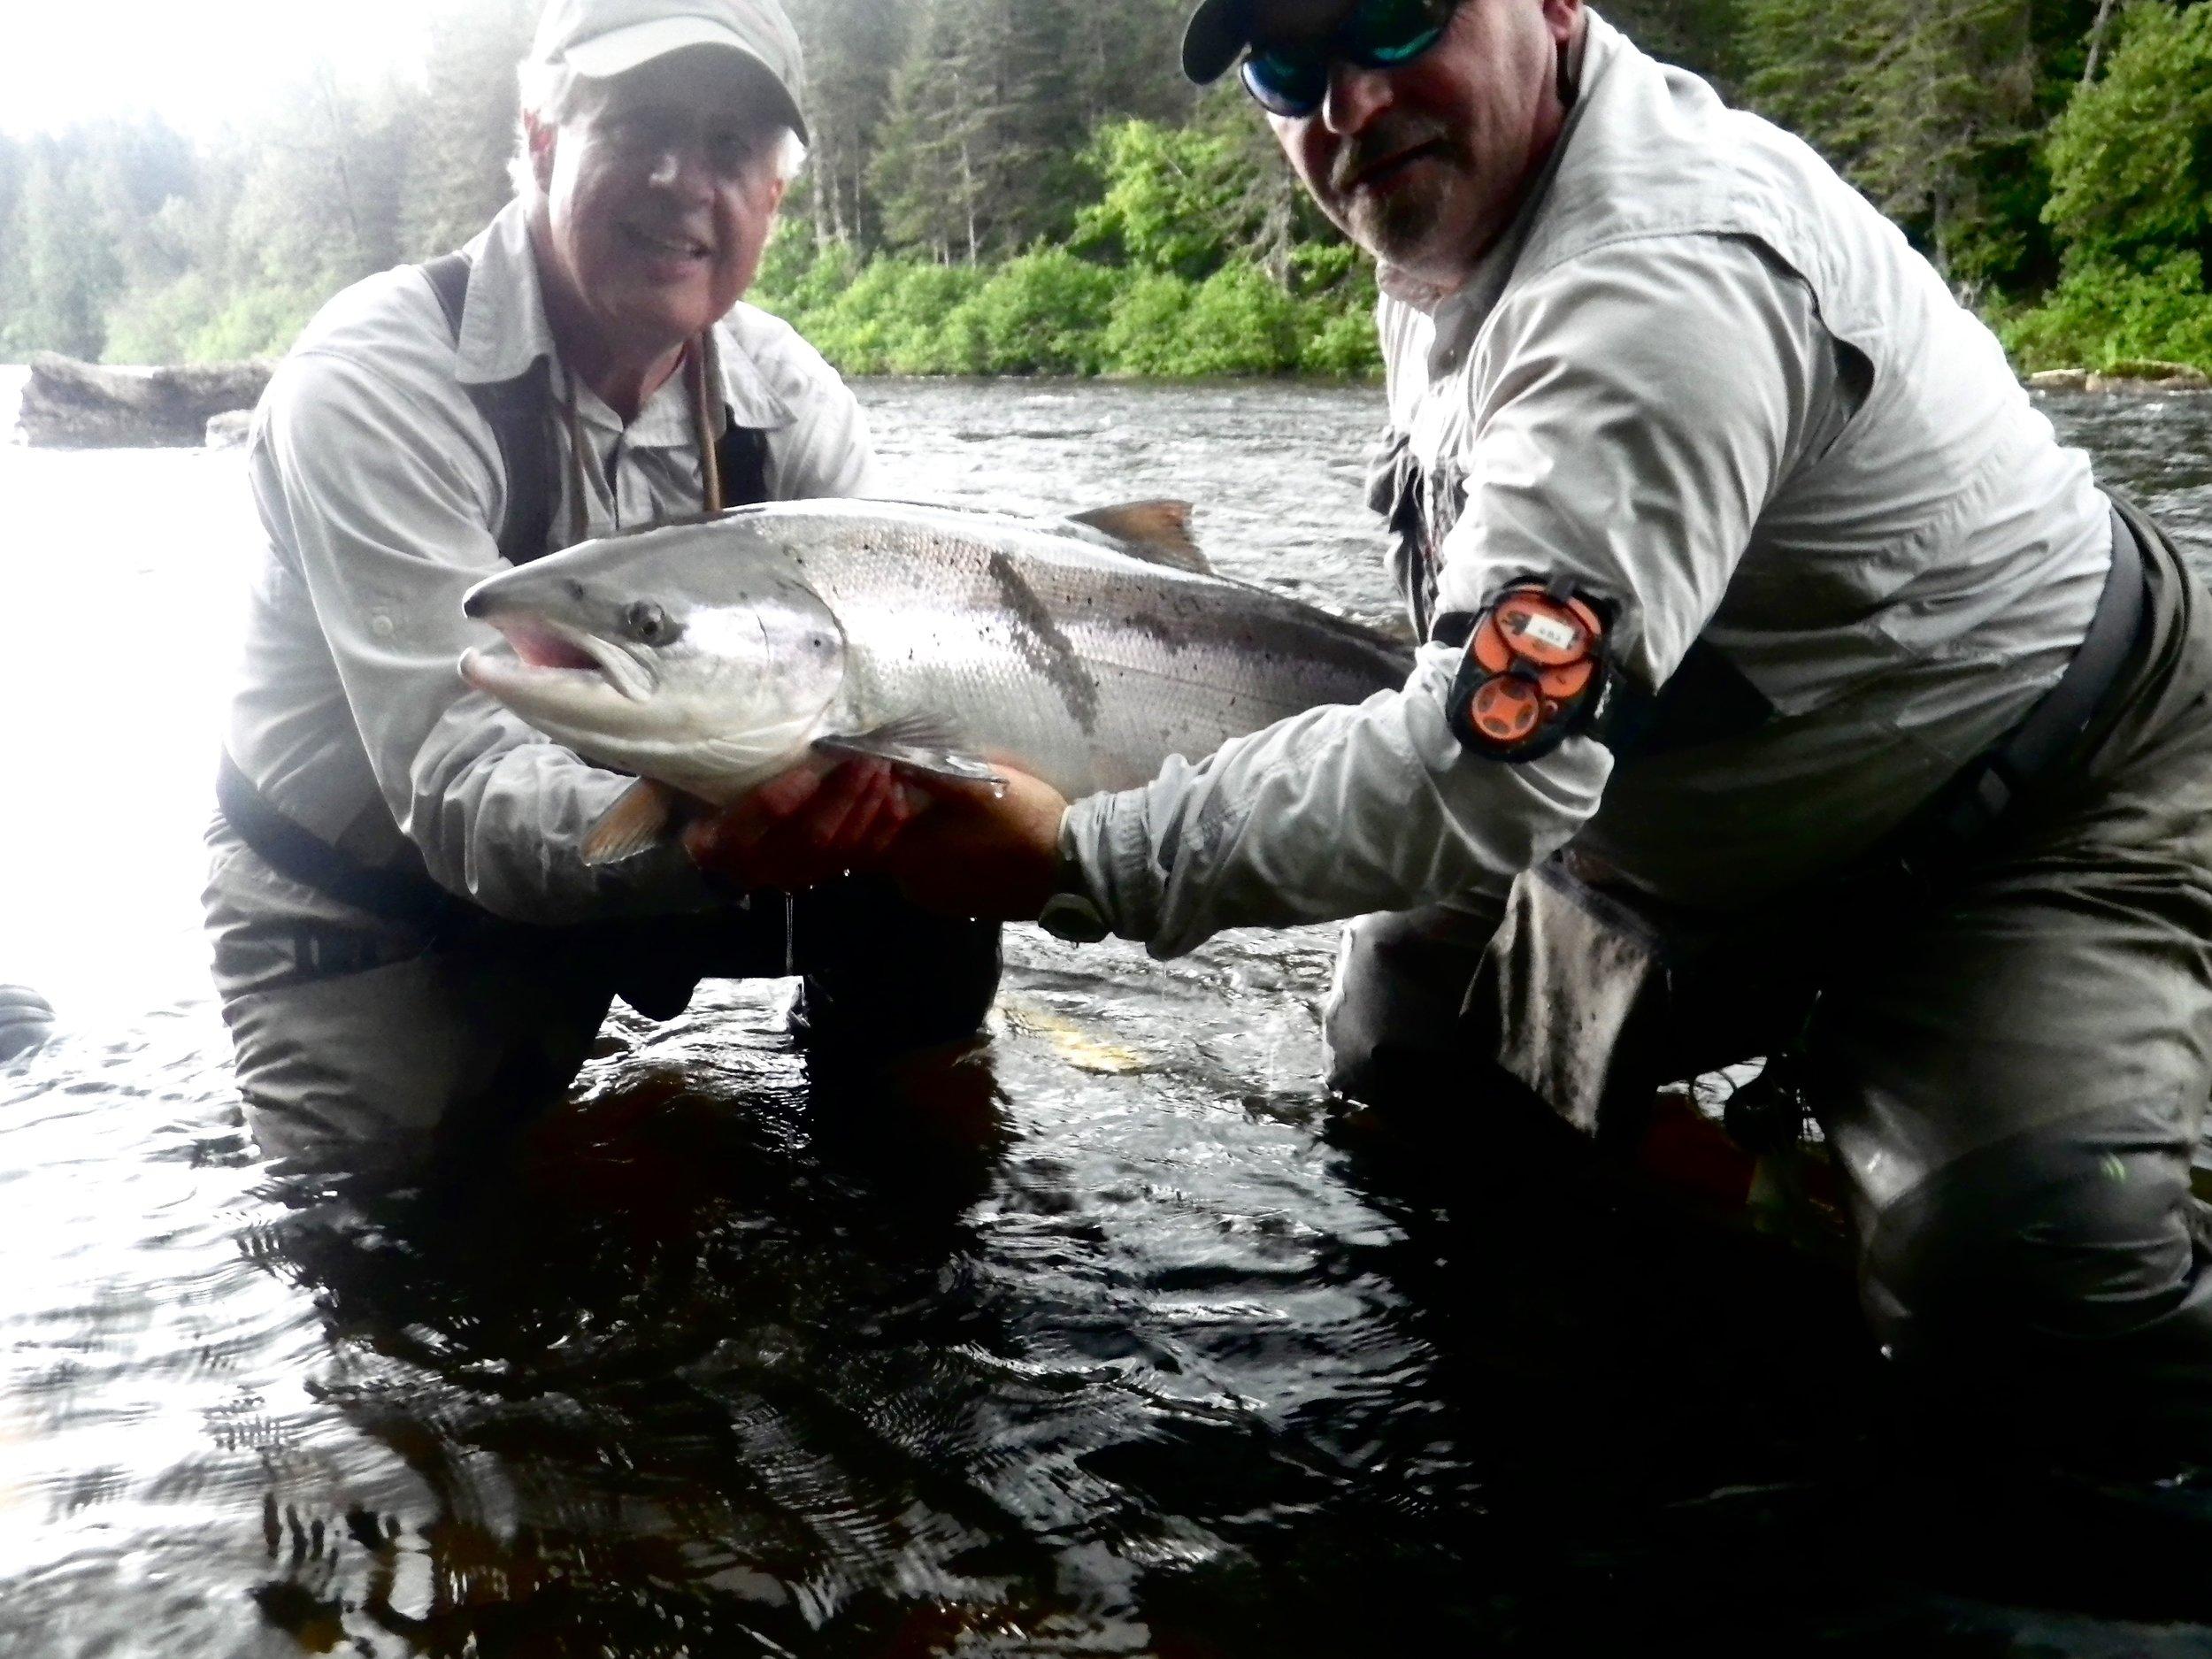 Camp Bonaventure regularJonathan Director (left) and master guide John Law with a beautiful fresh run salmon, congratulations Jon!